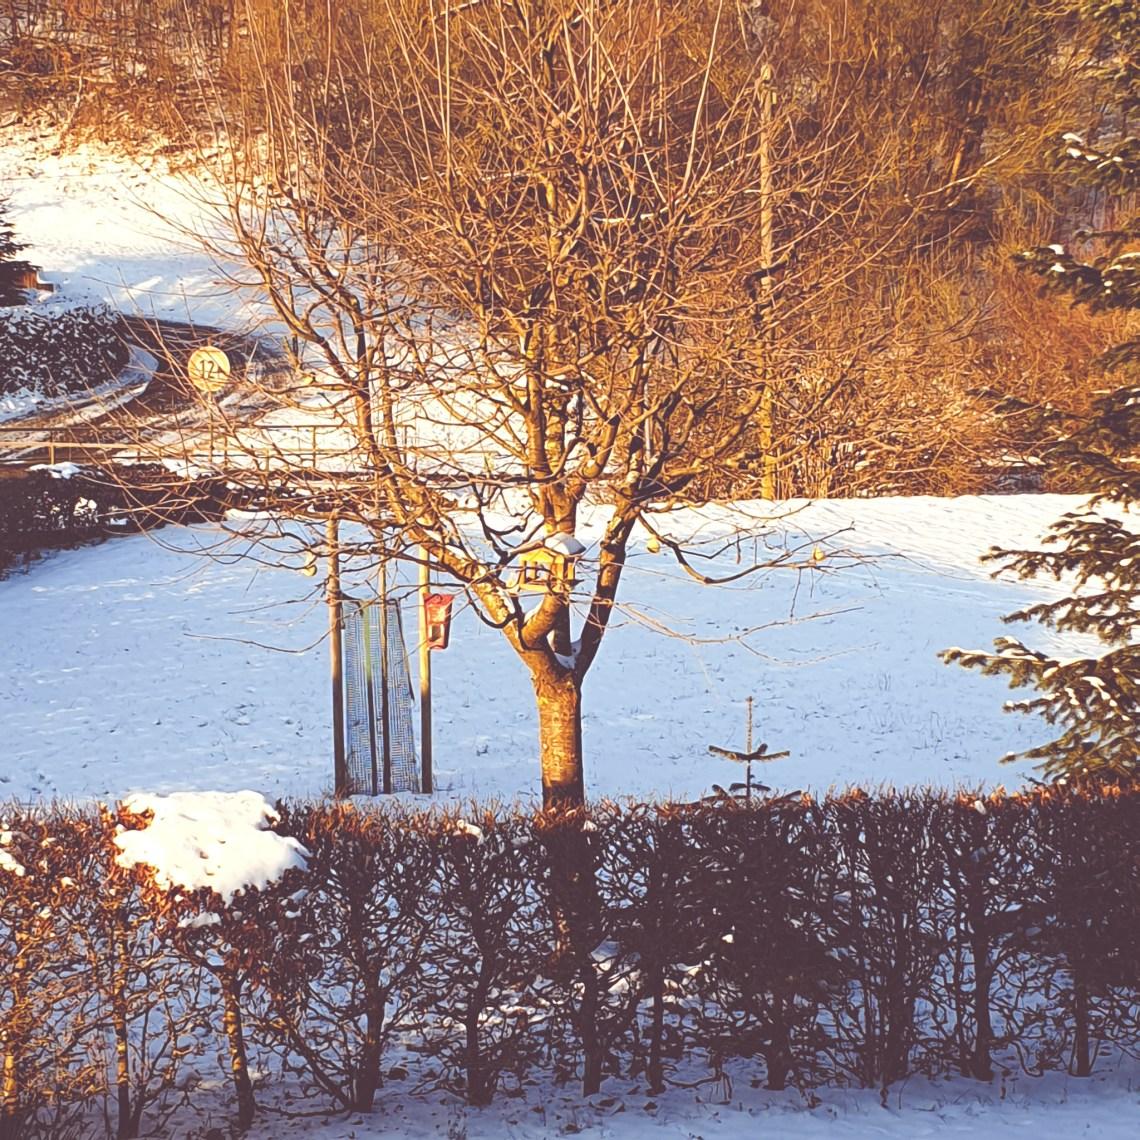 Vogelhaus morgens